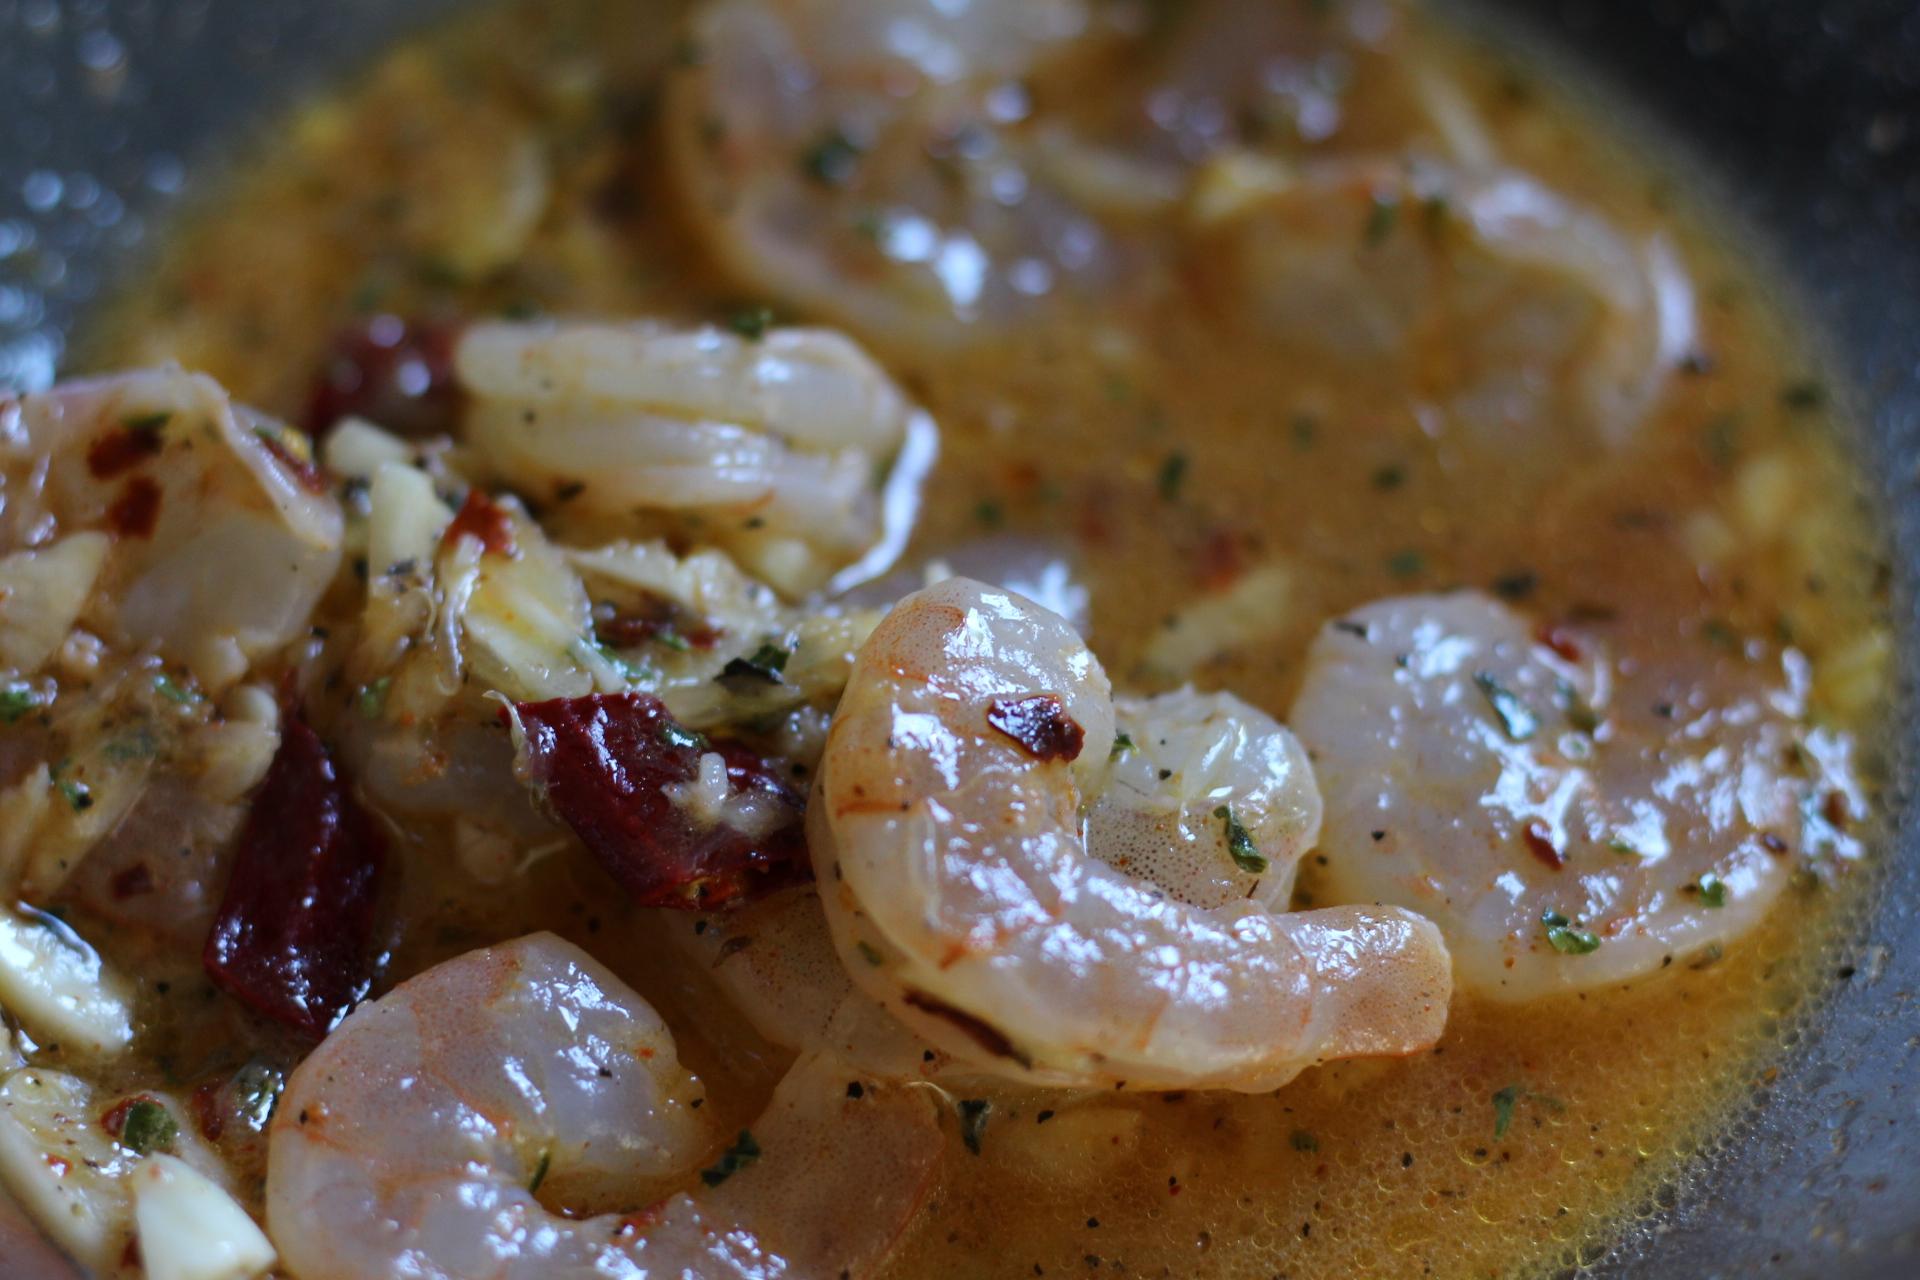 shrimp marinating